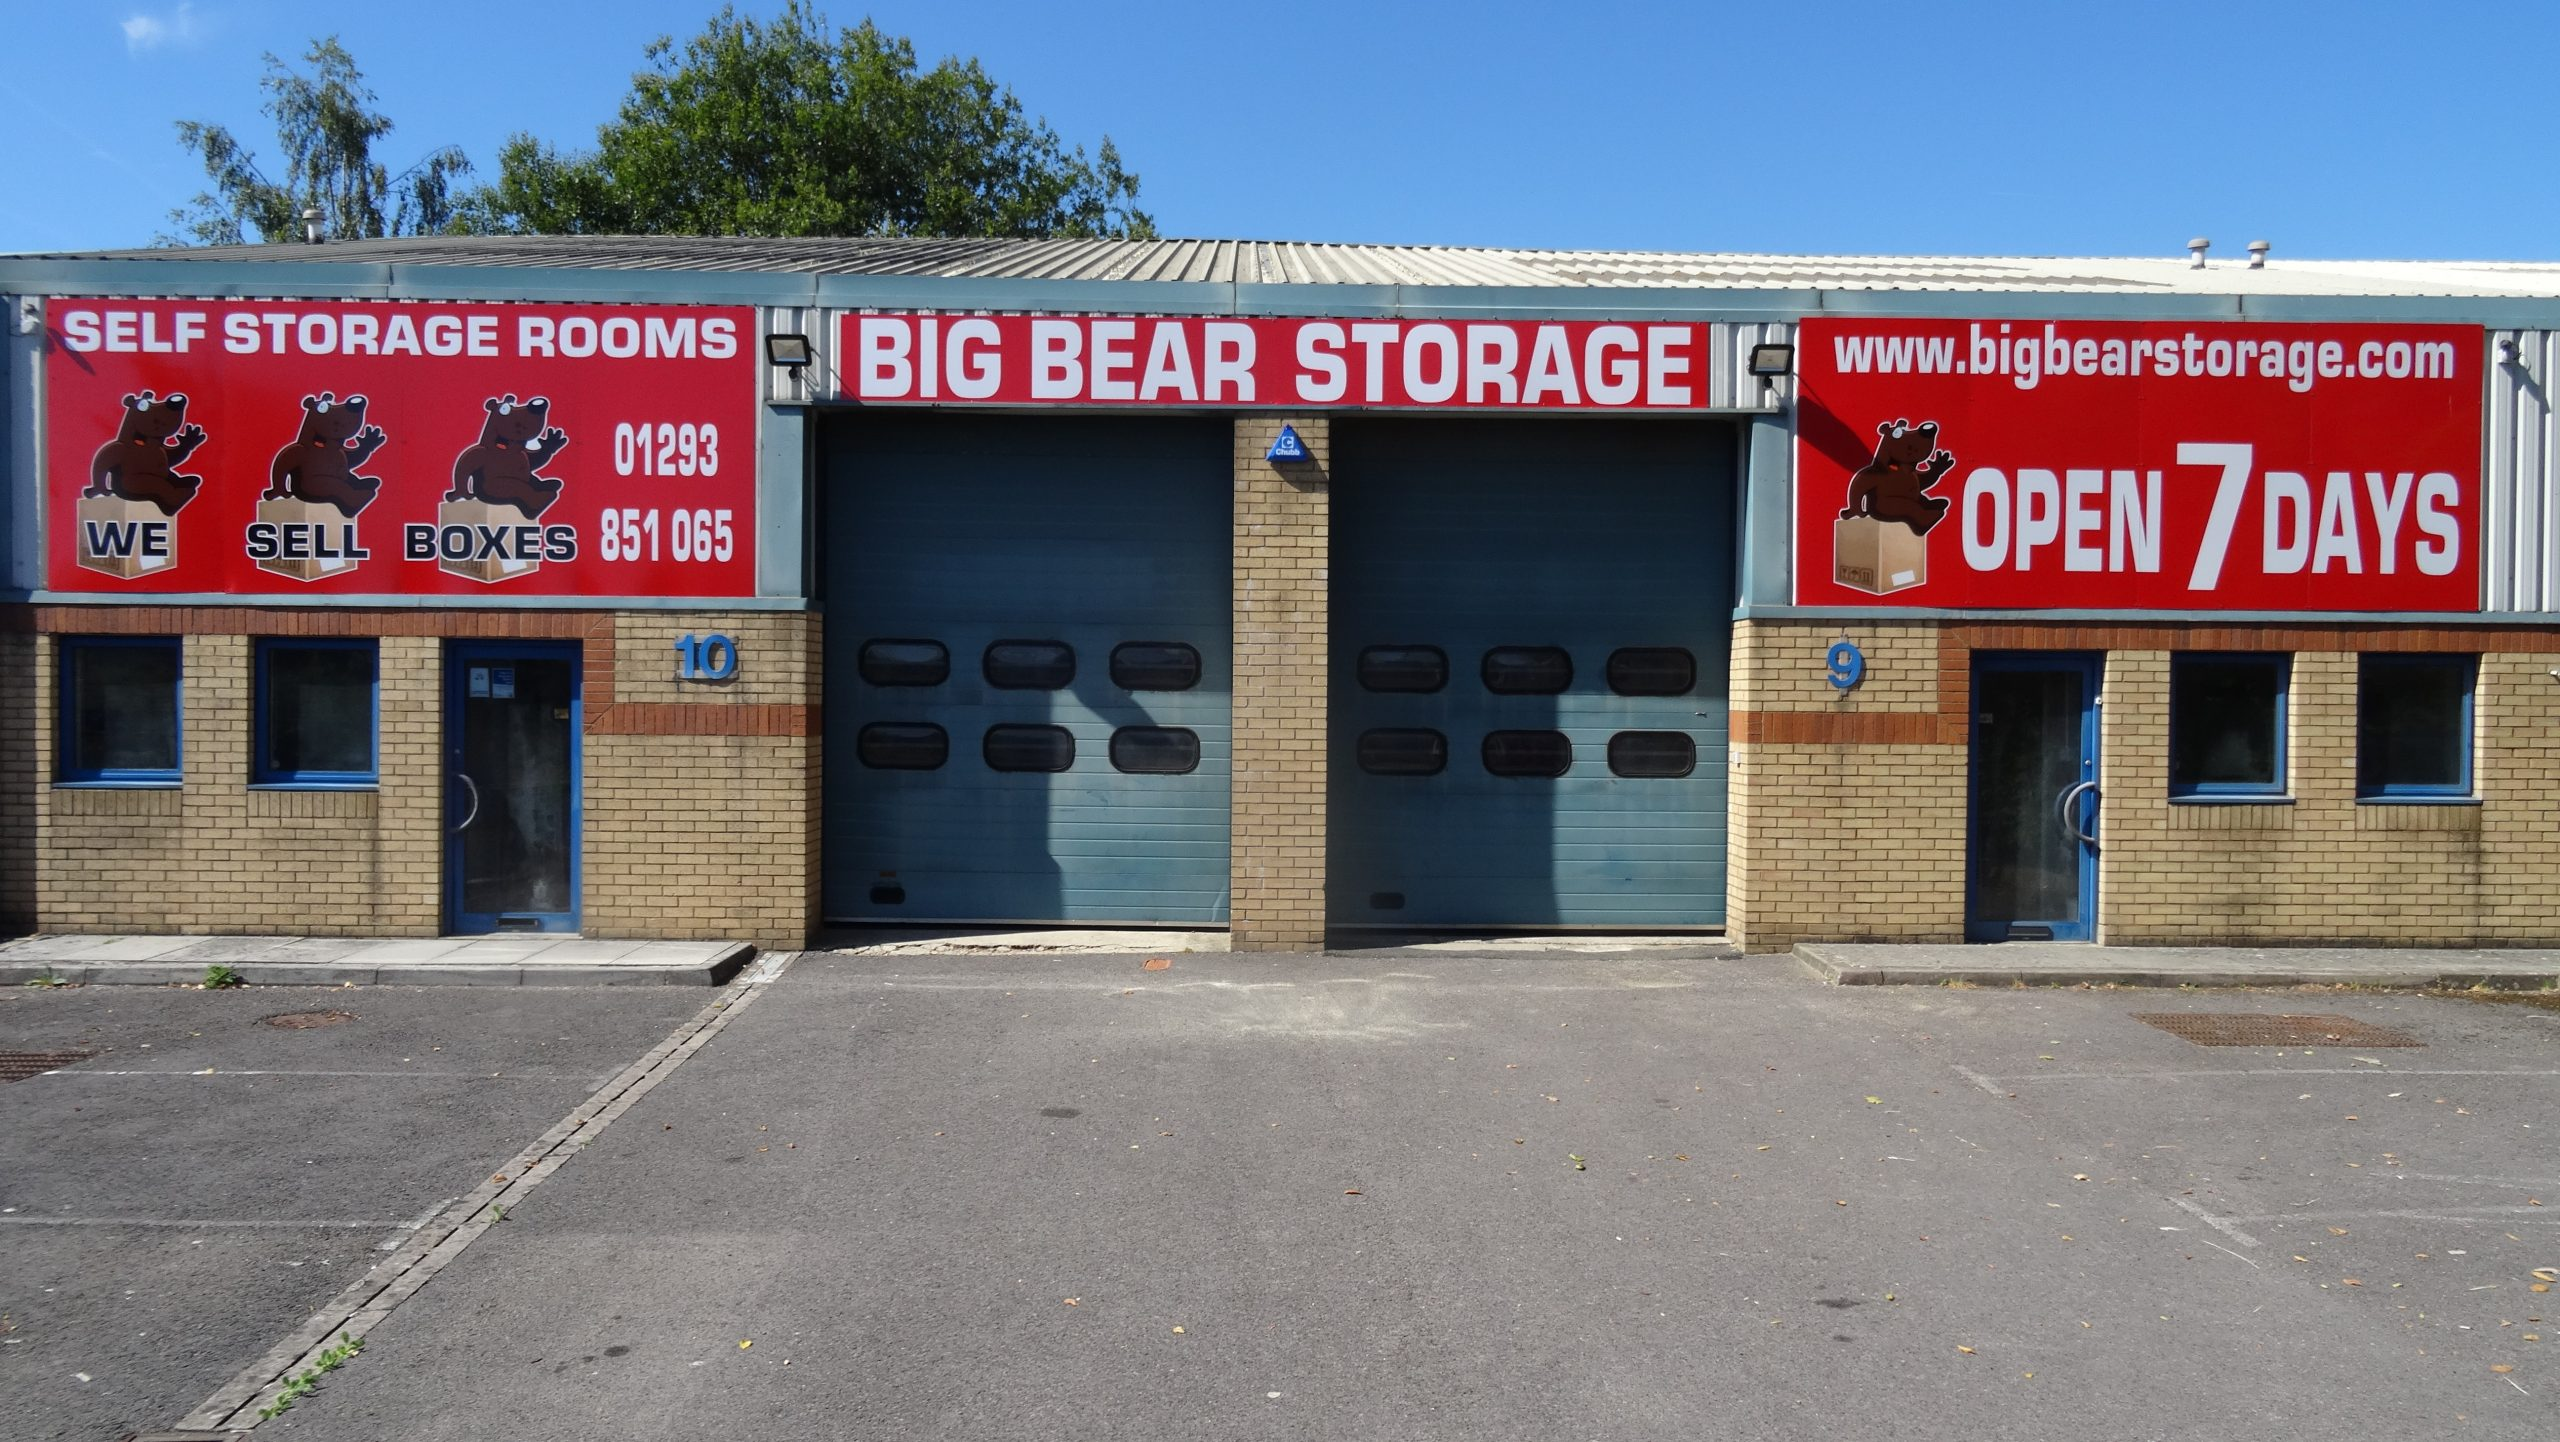 Big Bear Storage ( Horsham/CRAWLEY ) a storage company in Units 9-10 Faygate Business Centre Faygate Lane West Sussex, Horsham, UK